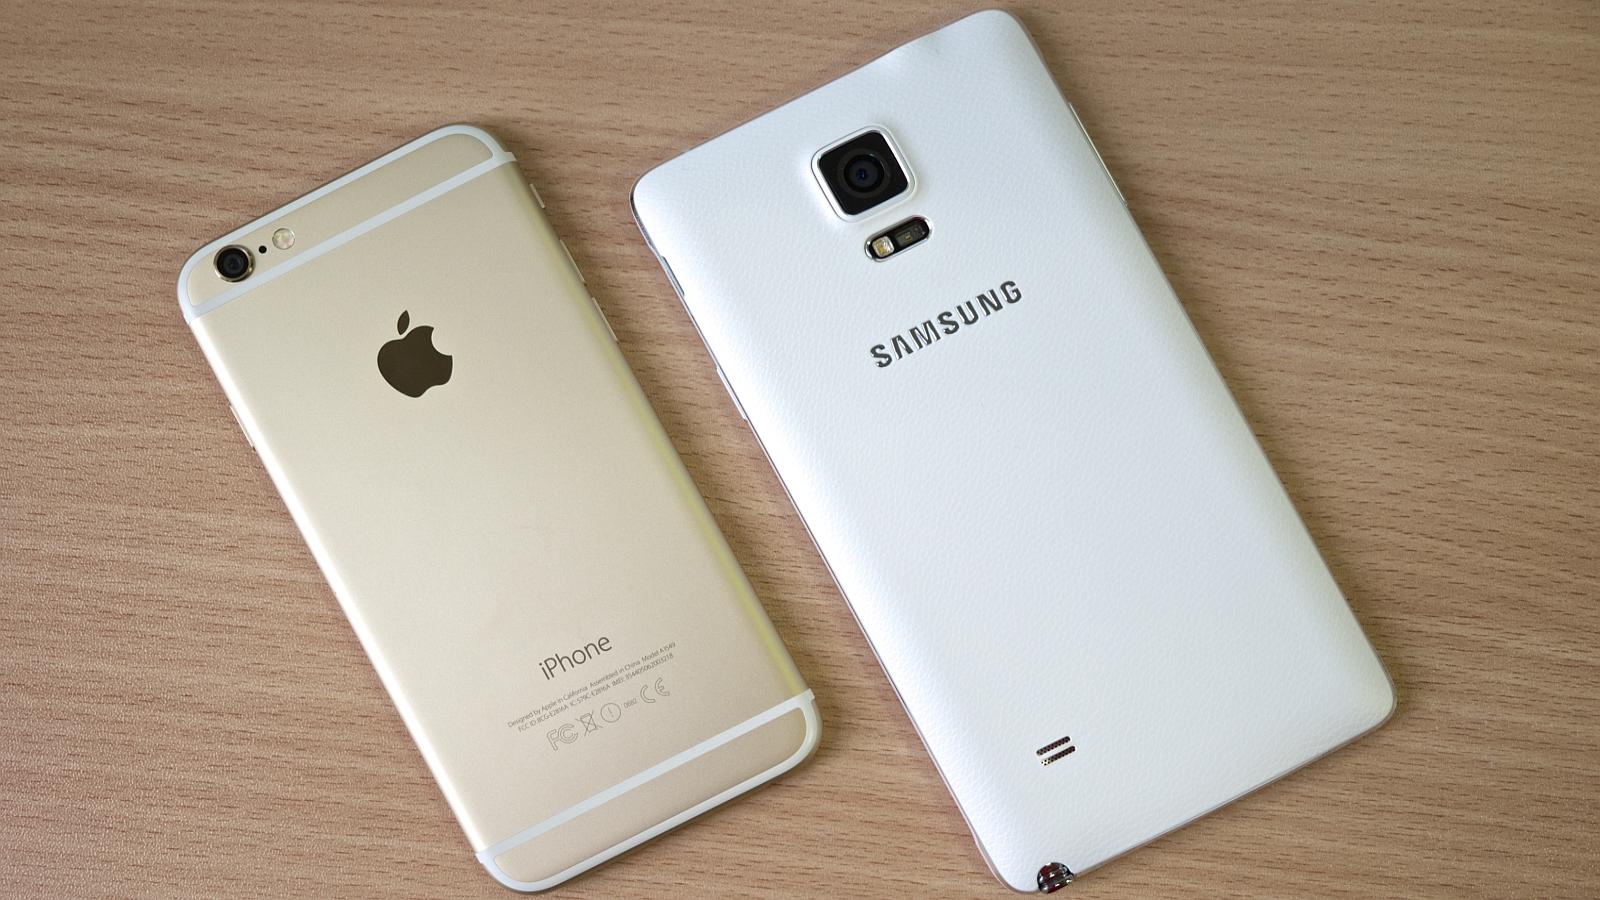 iPhone 6 Sam Galaxy Note 4 Karlis Dembrans